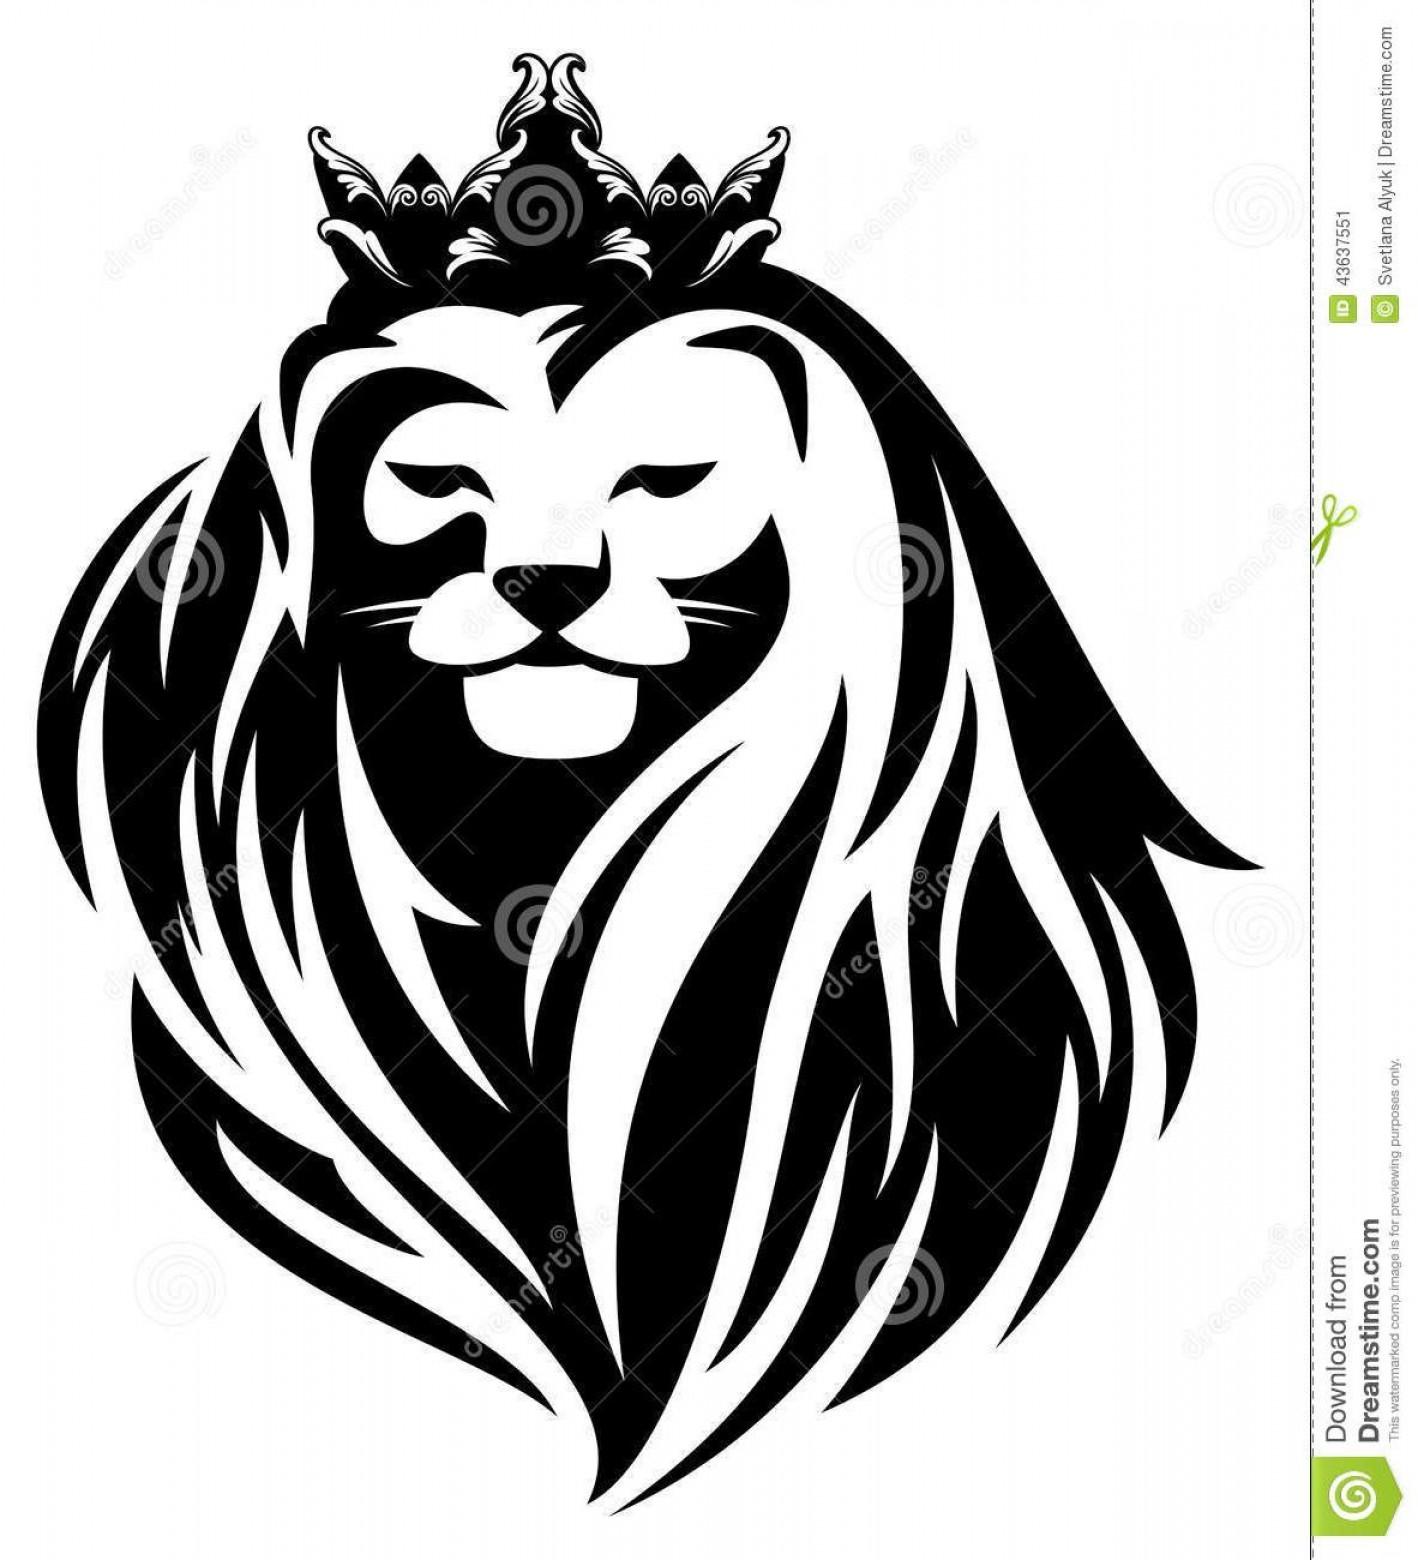 1418x1560 Top Royal Lion Crown Animal King Head Long Mane Black White Vector